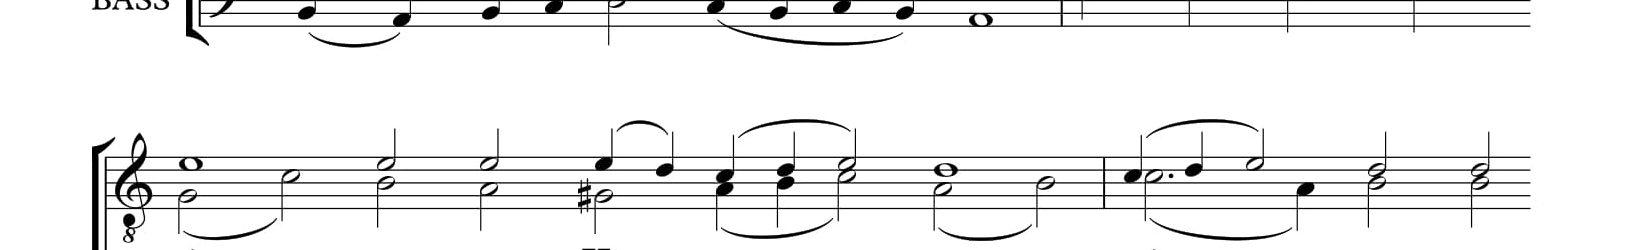 Догматик, глас 5 (Знаменное)